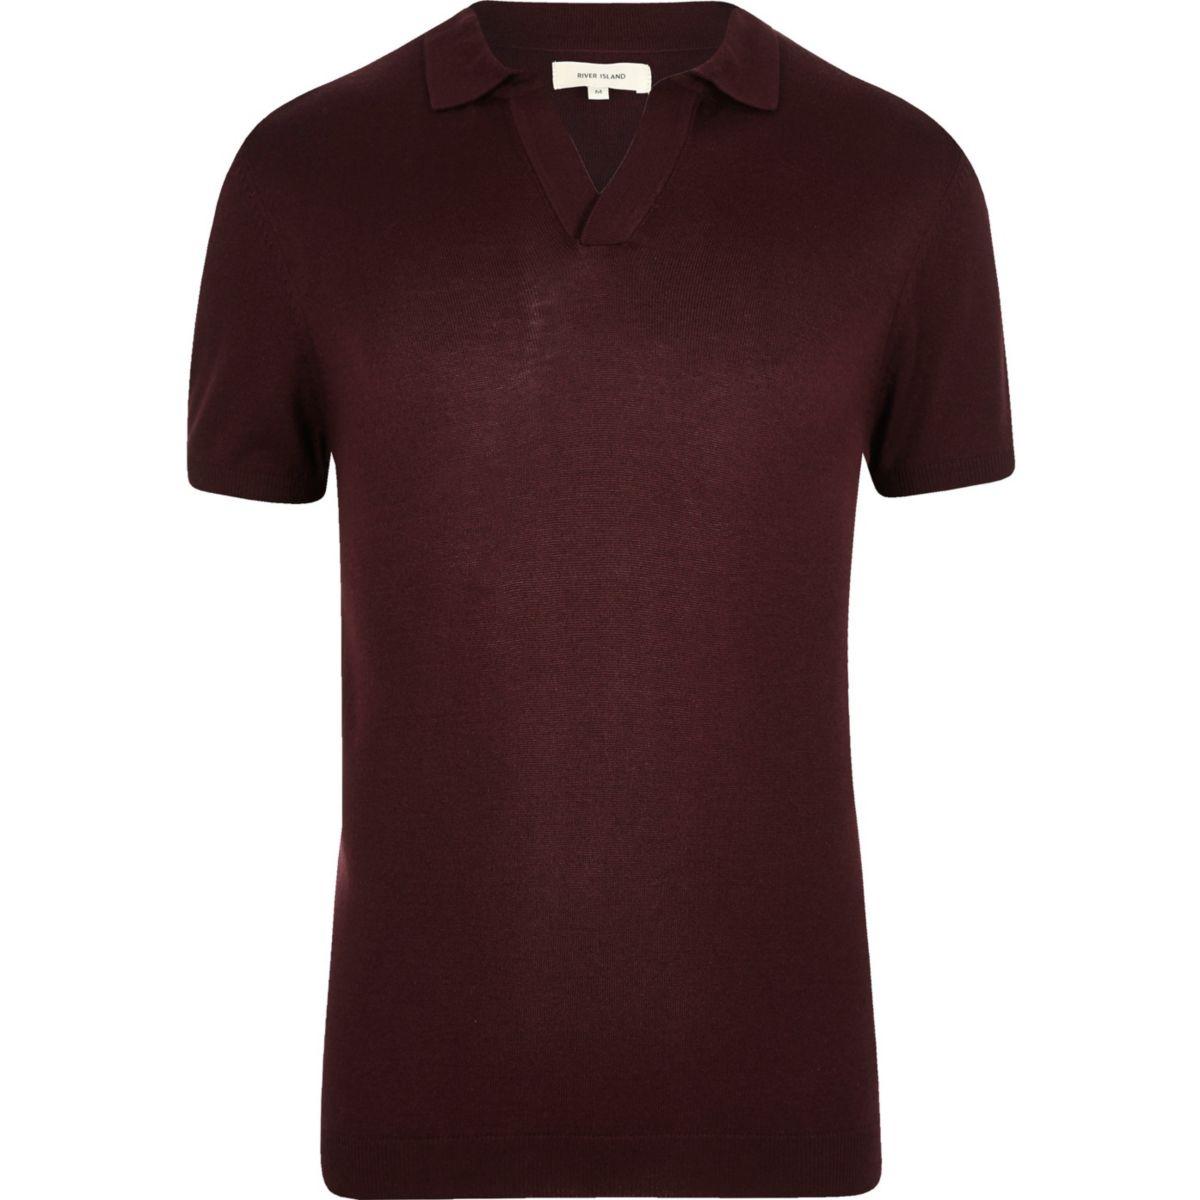 Burgundy revere collar slim fit polo shirt